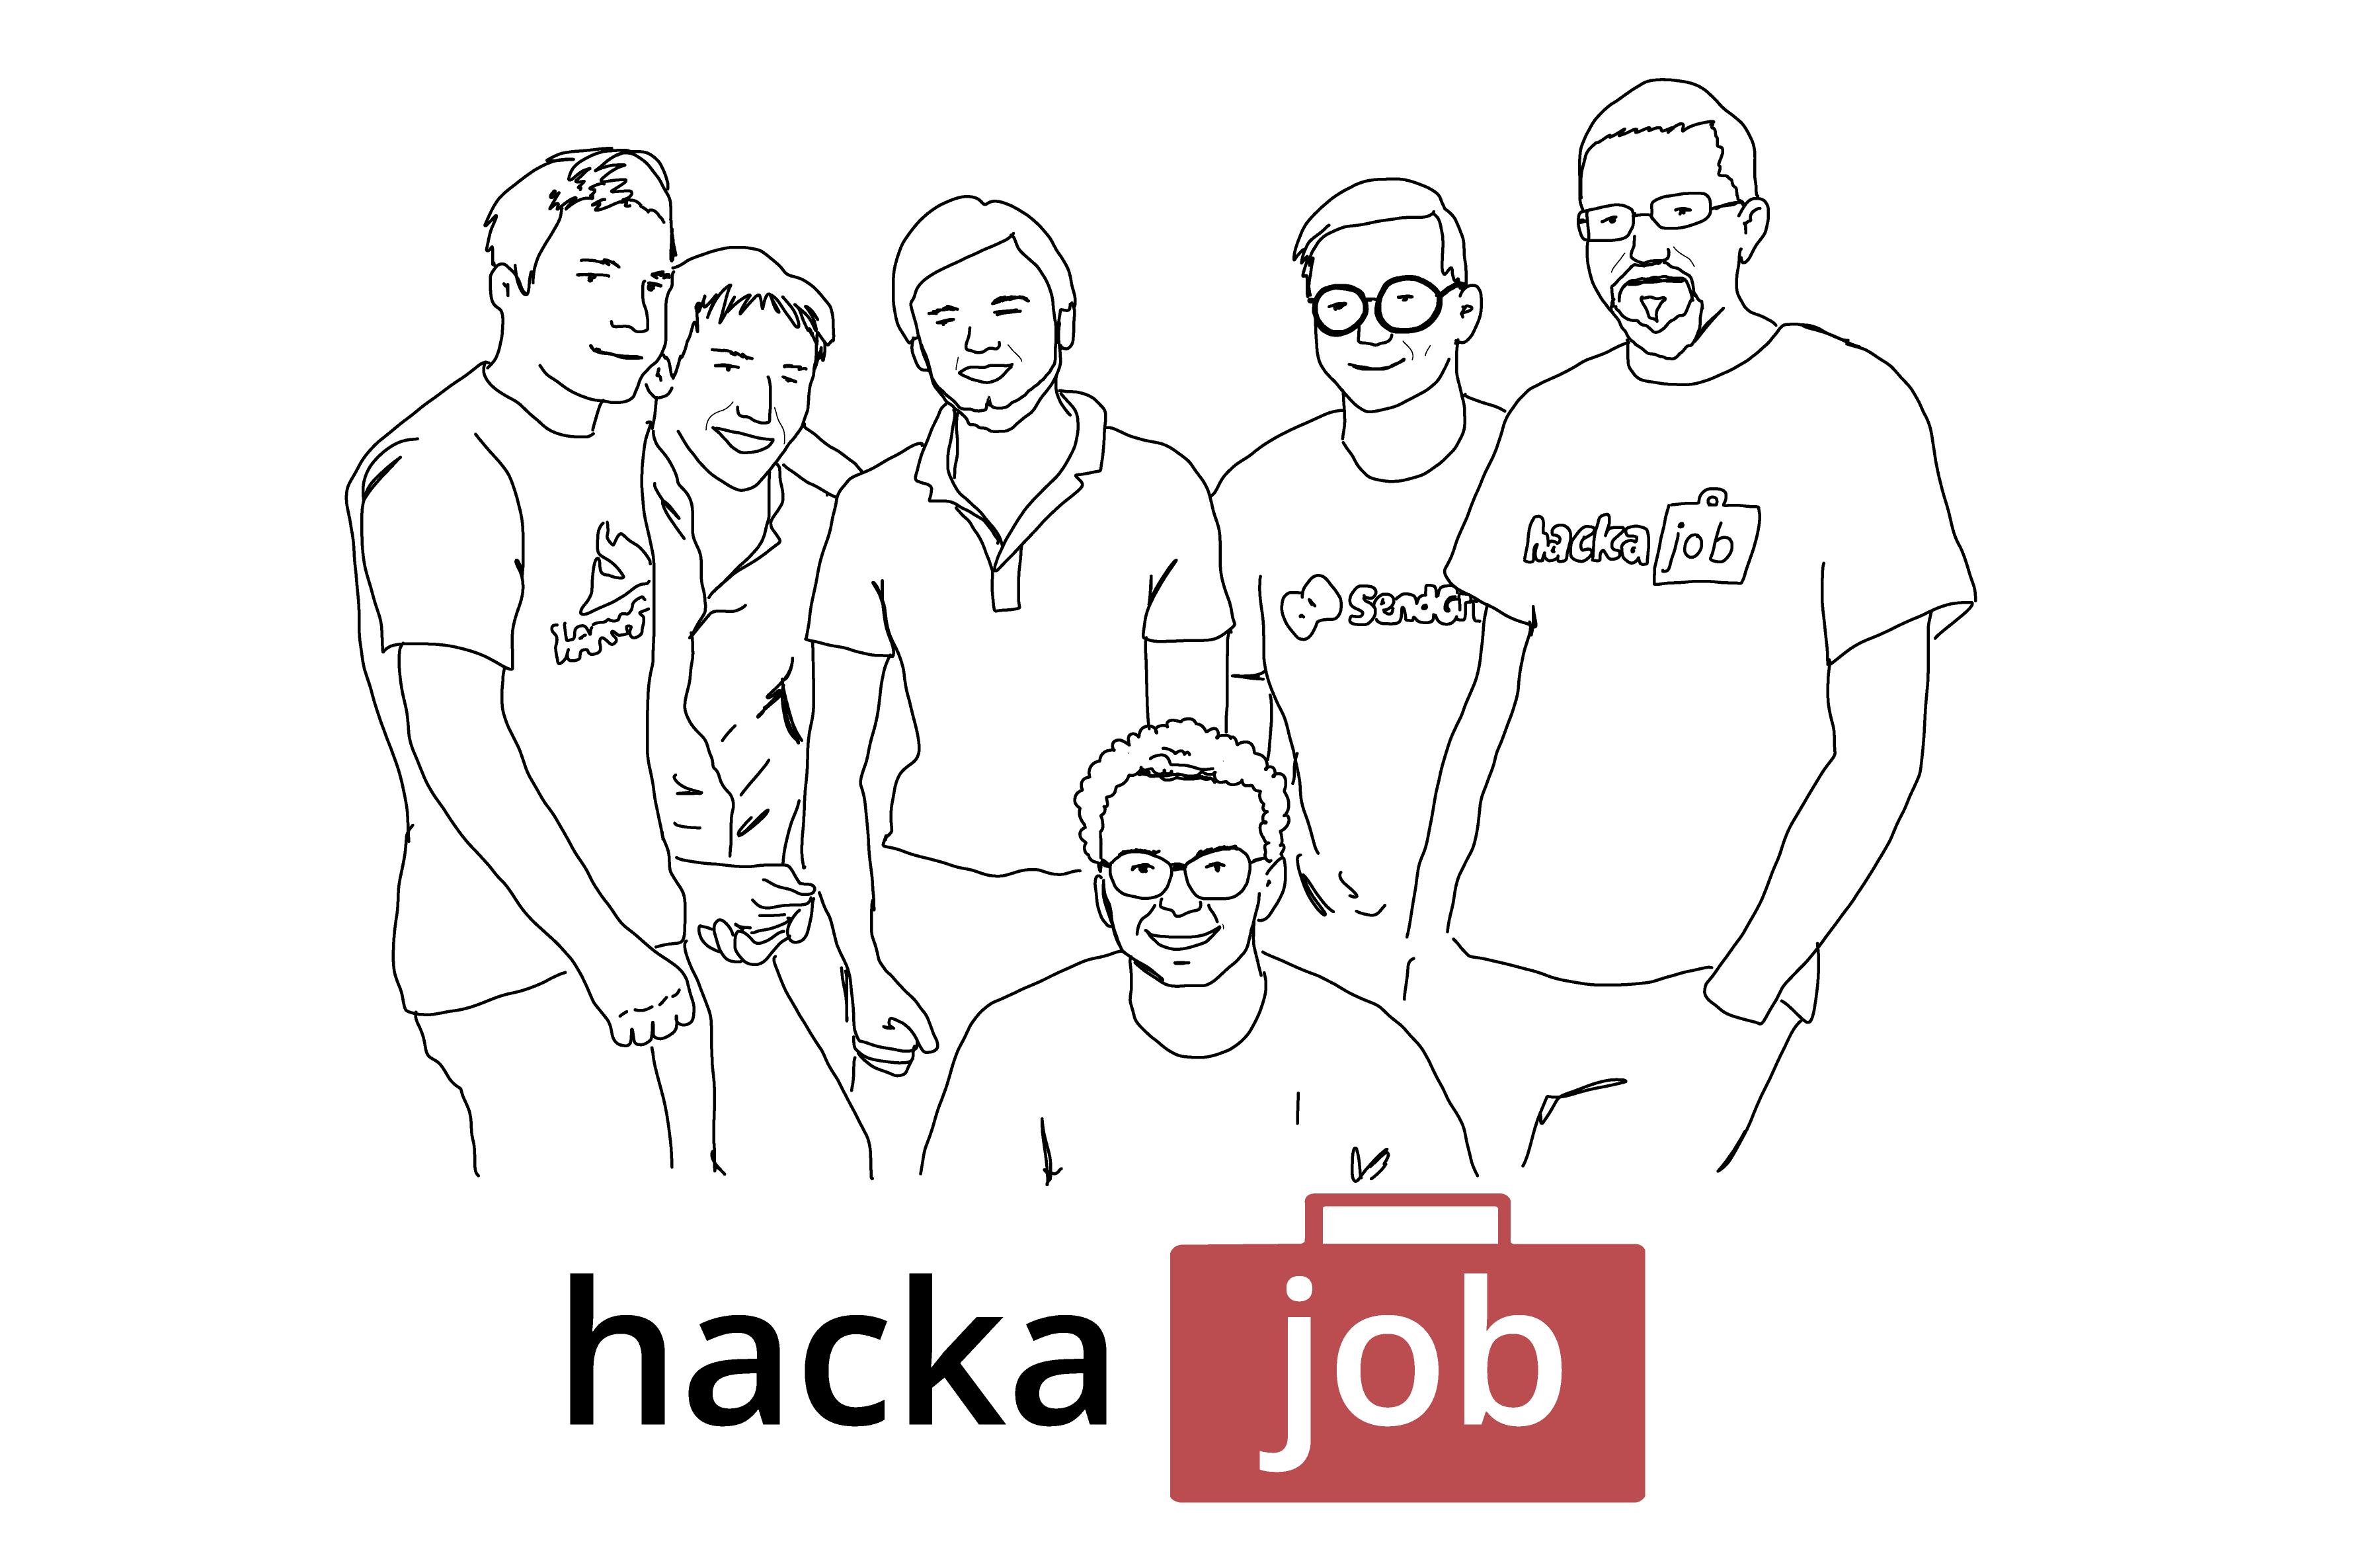 Hackajob Fast Energetic Metric Driven Deekit